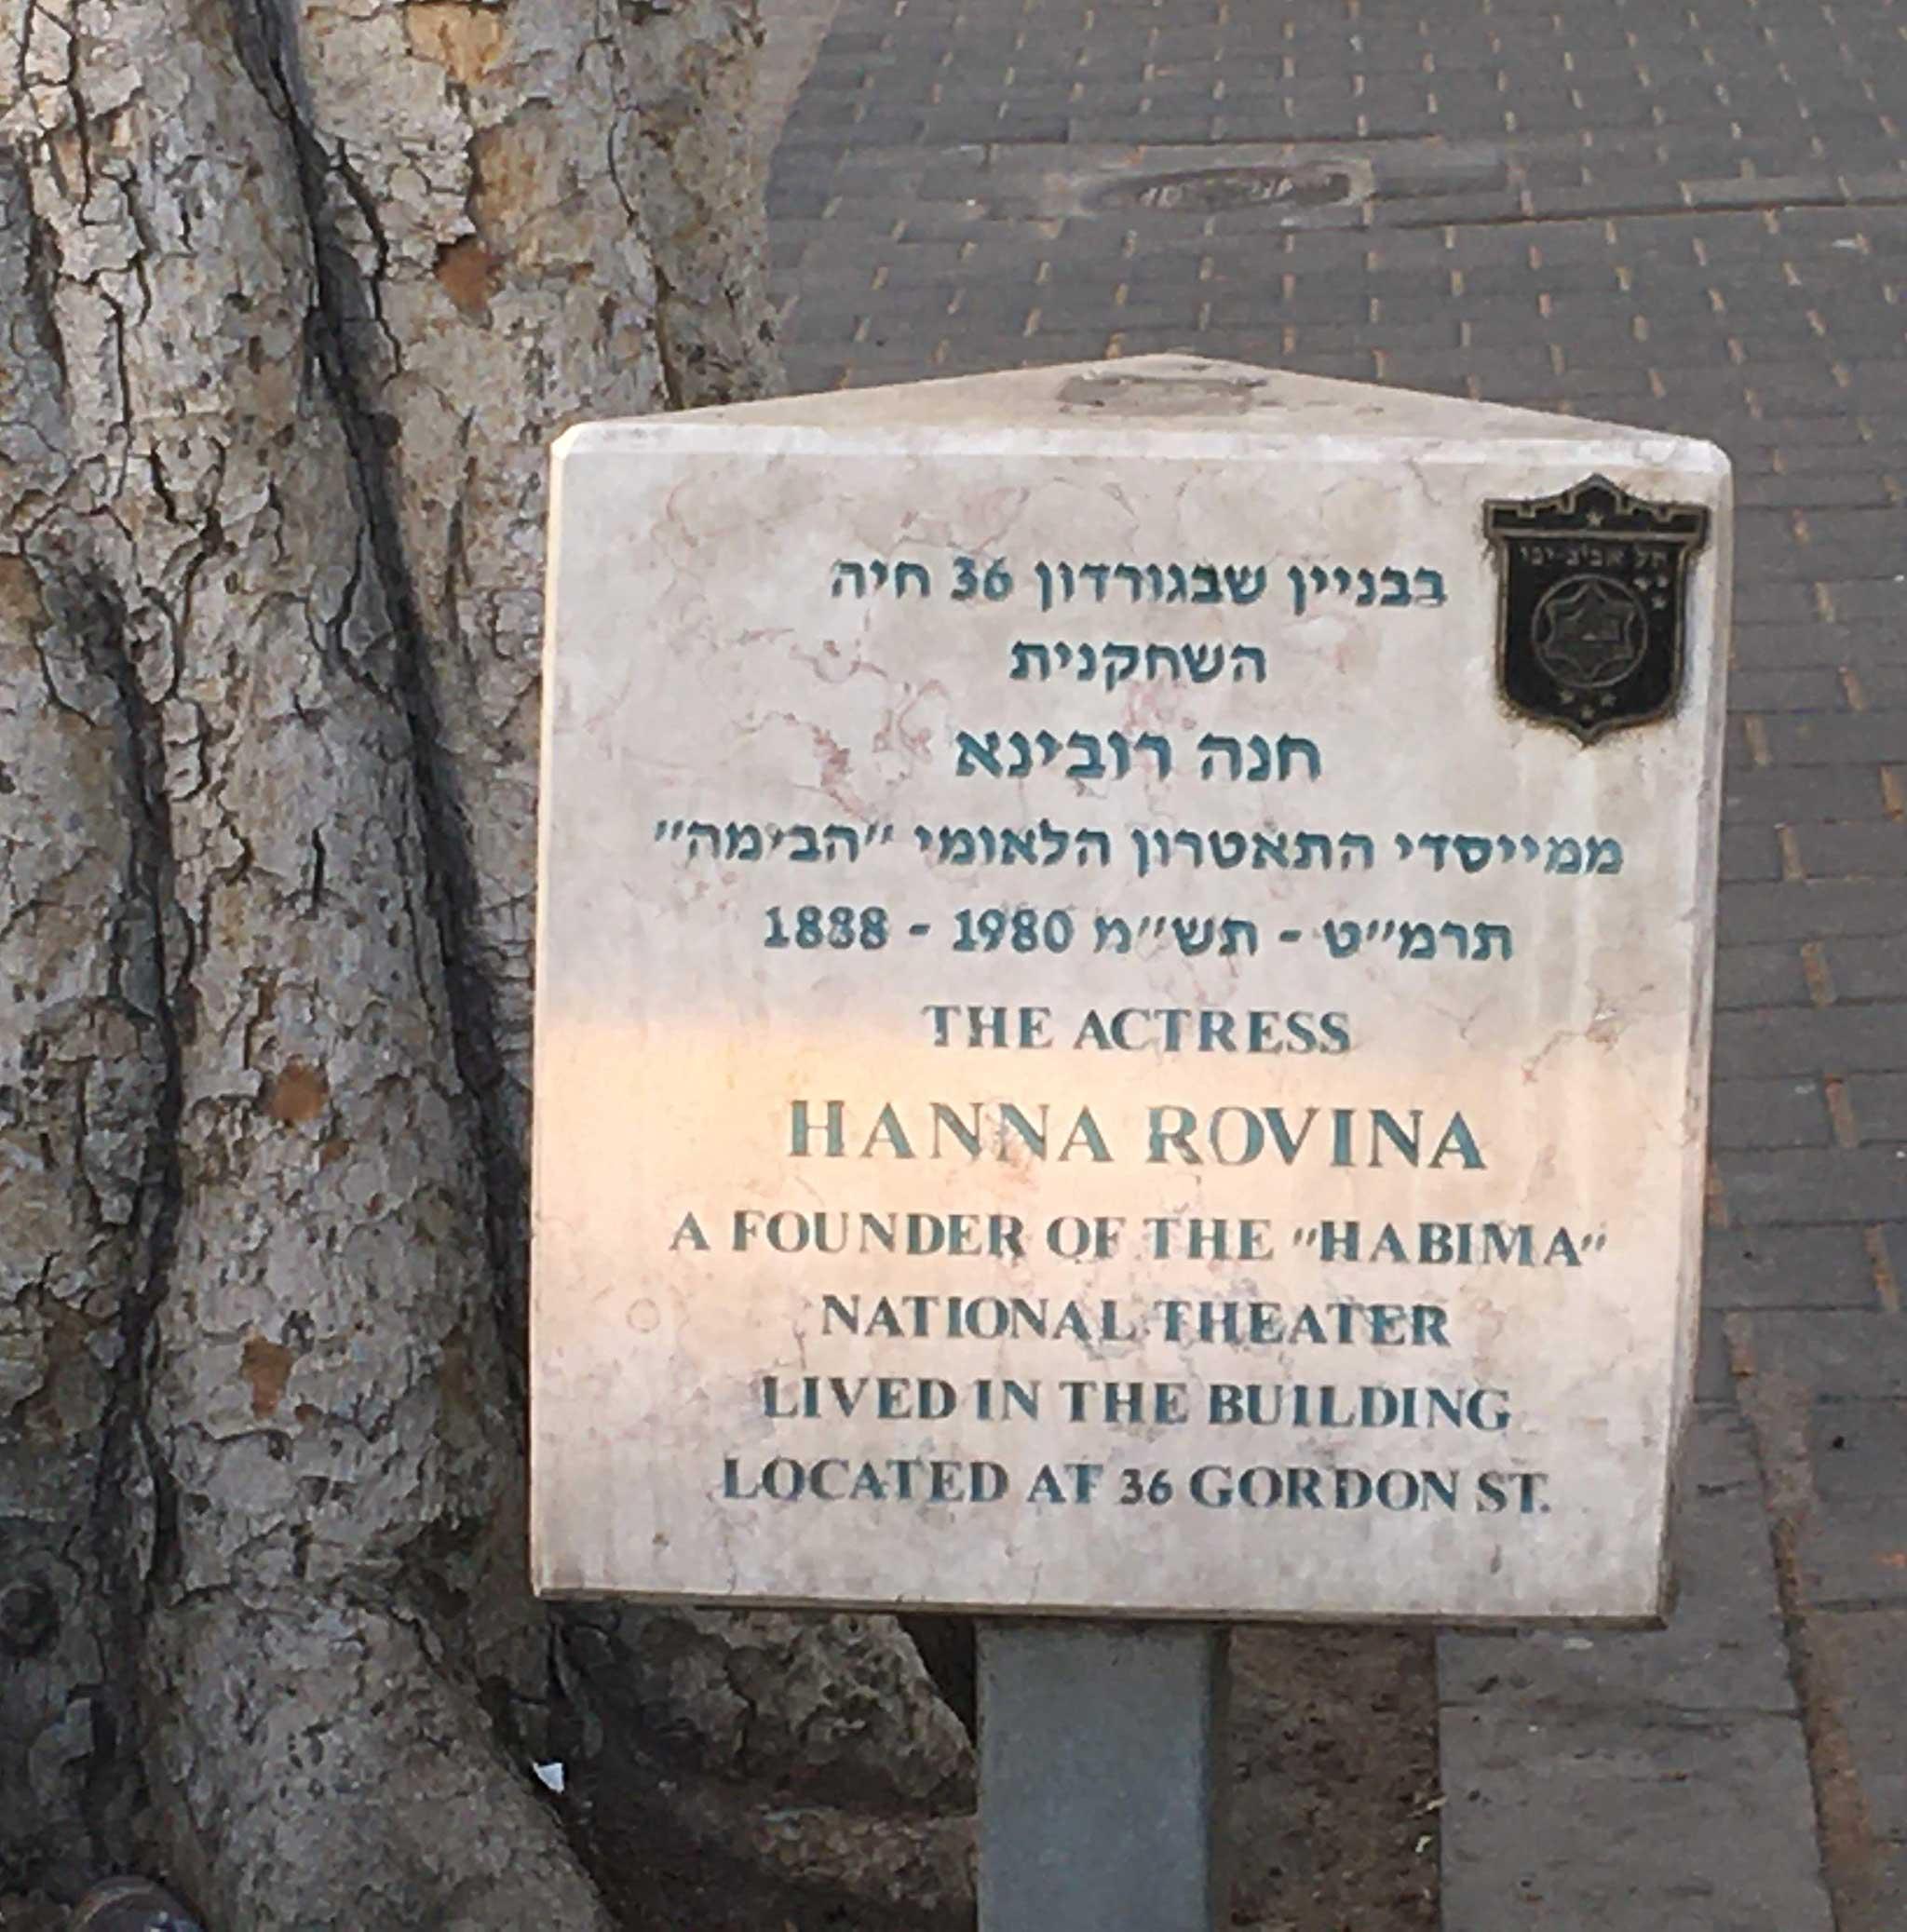 Hanna Rovina's House on Tel Aviv audio tour The White City